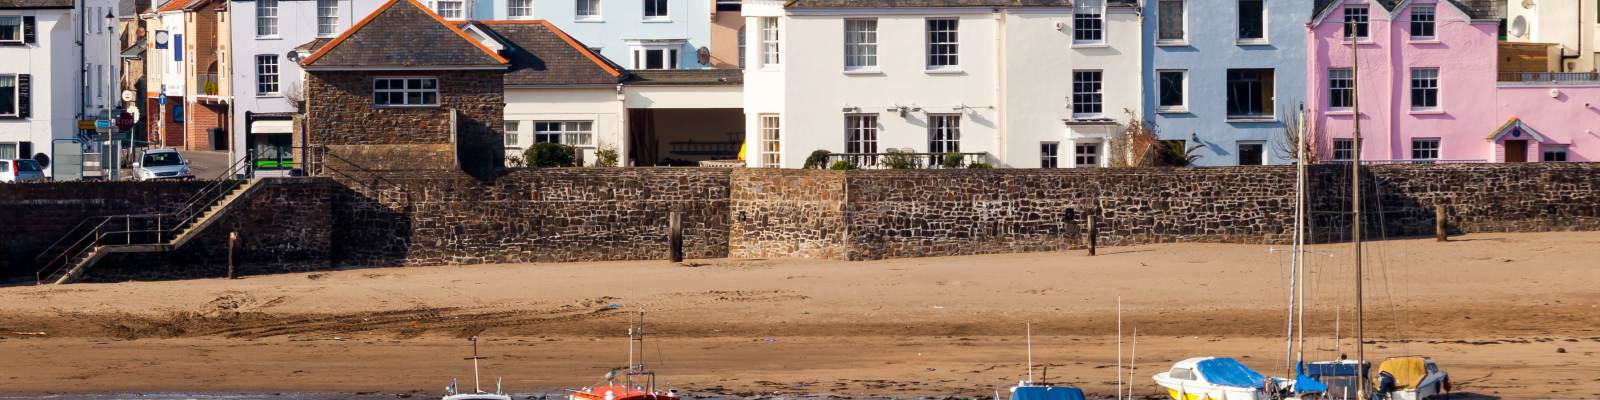 Holiday Cottages In Devon To Rent Self Catering Devon